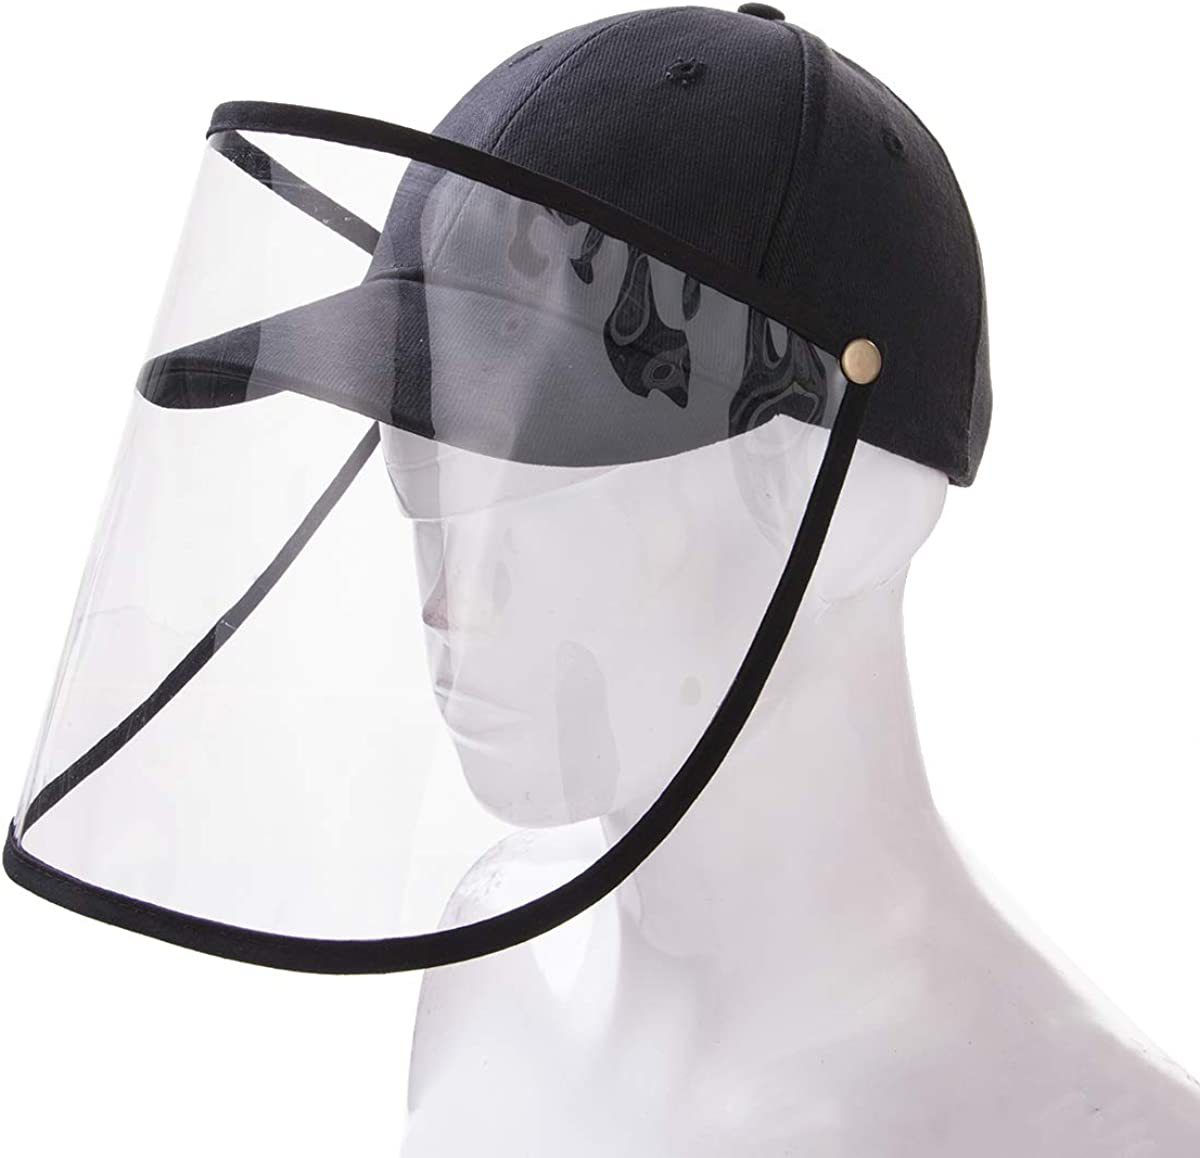 USA SHIP~FOLDABLE-Face-Shield// Visor Anti-fog// Splash Cap Sun Hat